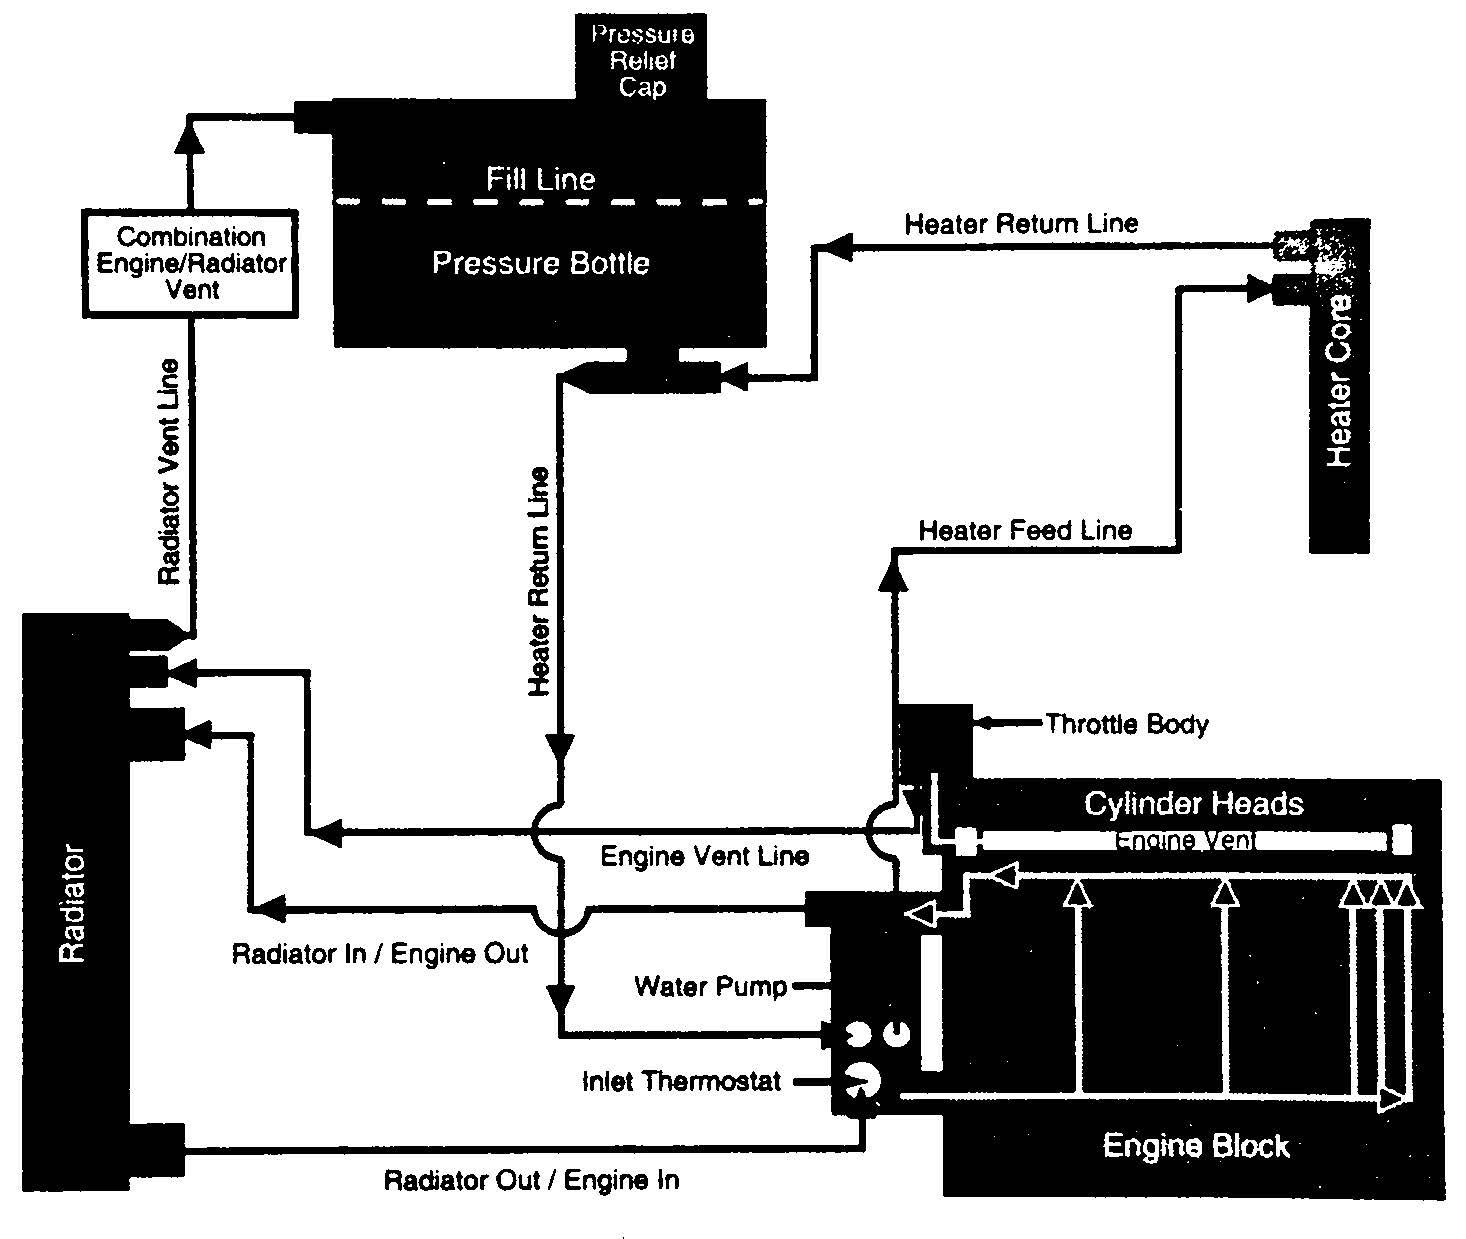 sa86_fullbook_ls1ls6_page_020_image_0002 • LS Engine DIY